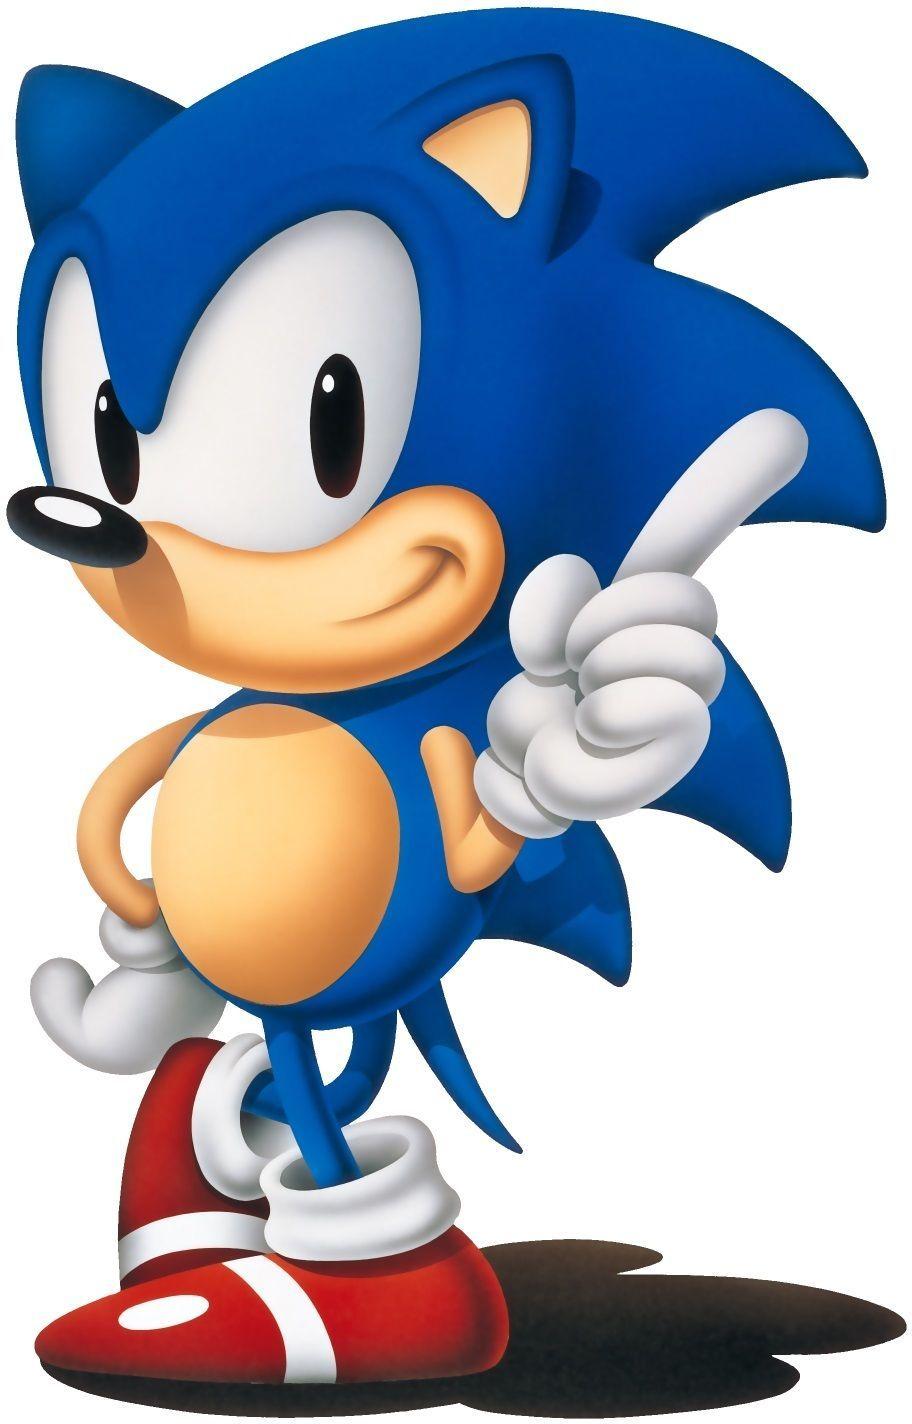 2 5 Sonic 19 T Shirt Iron On Transfer Light Fabric 8x10 5x7 3x3 Ebay Home Garden Sonic Birthday Sonic Birthday Parties Sonic